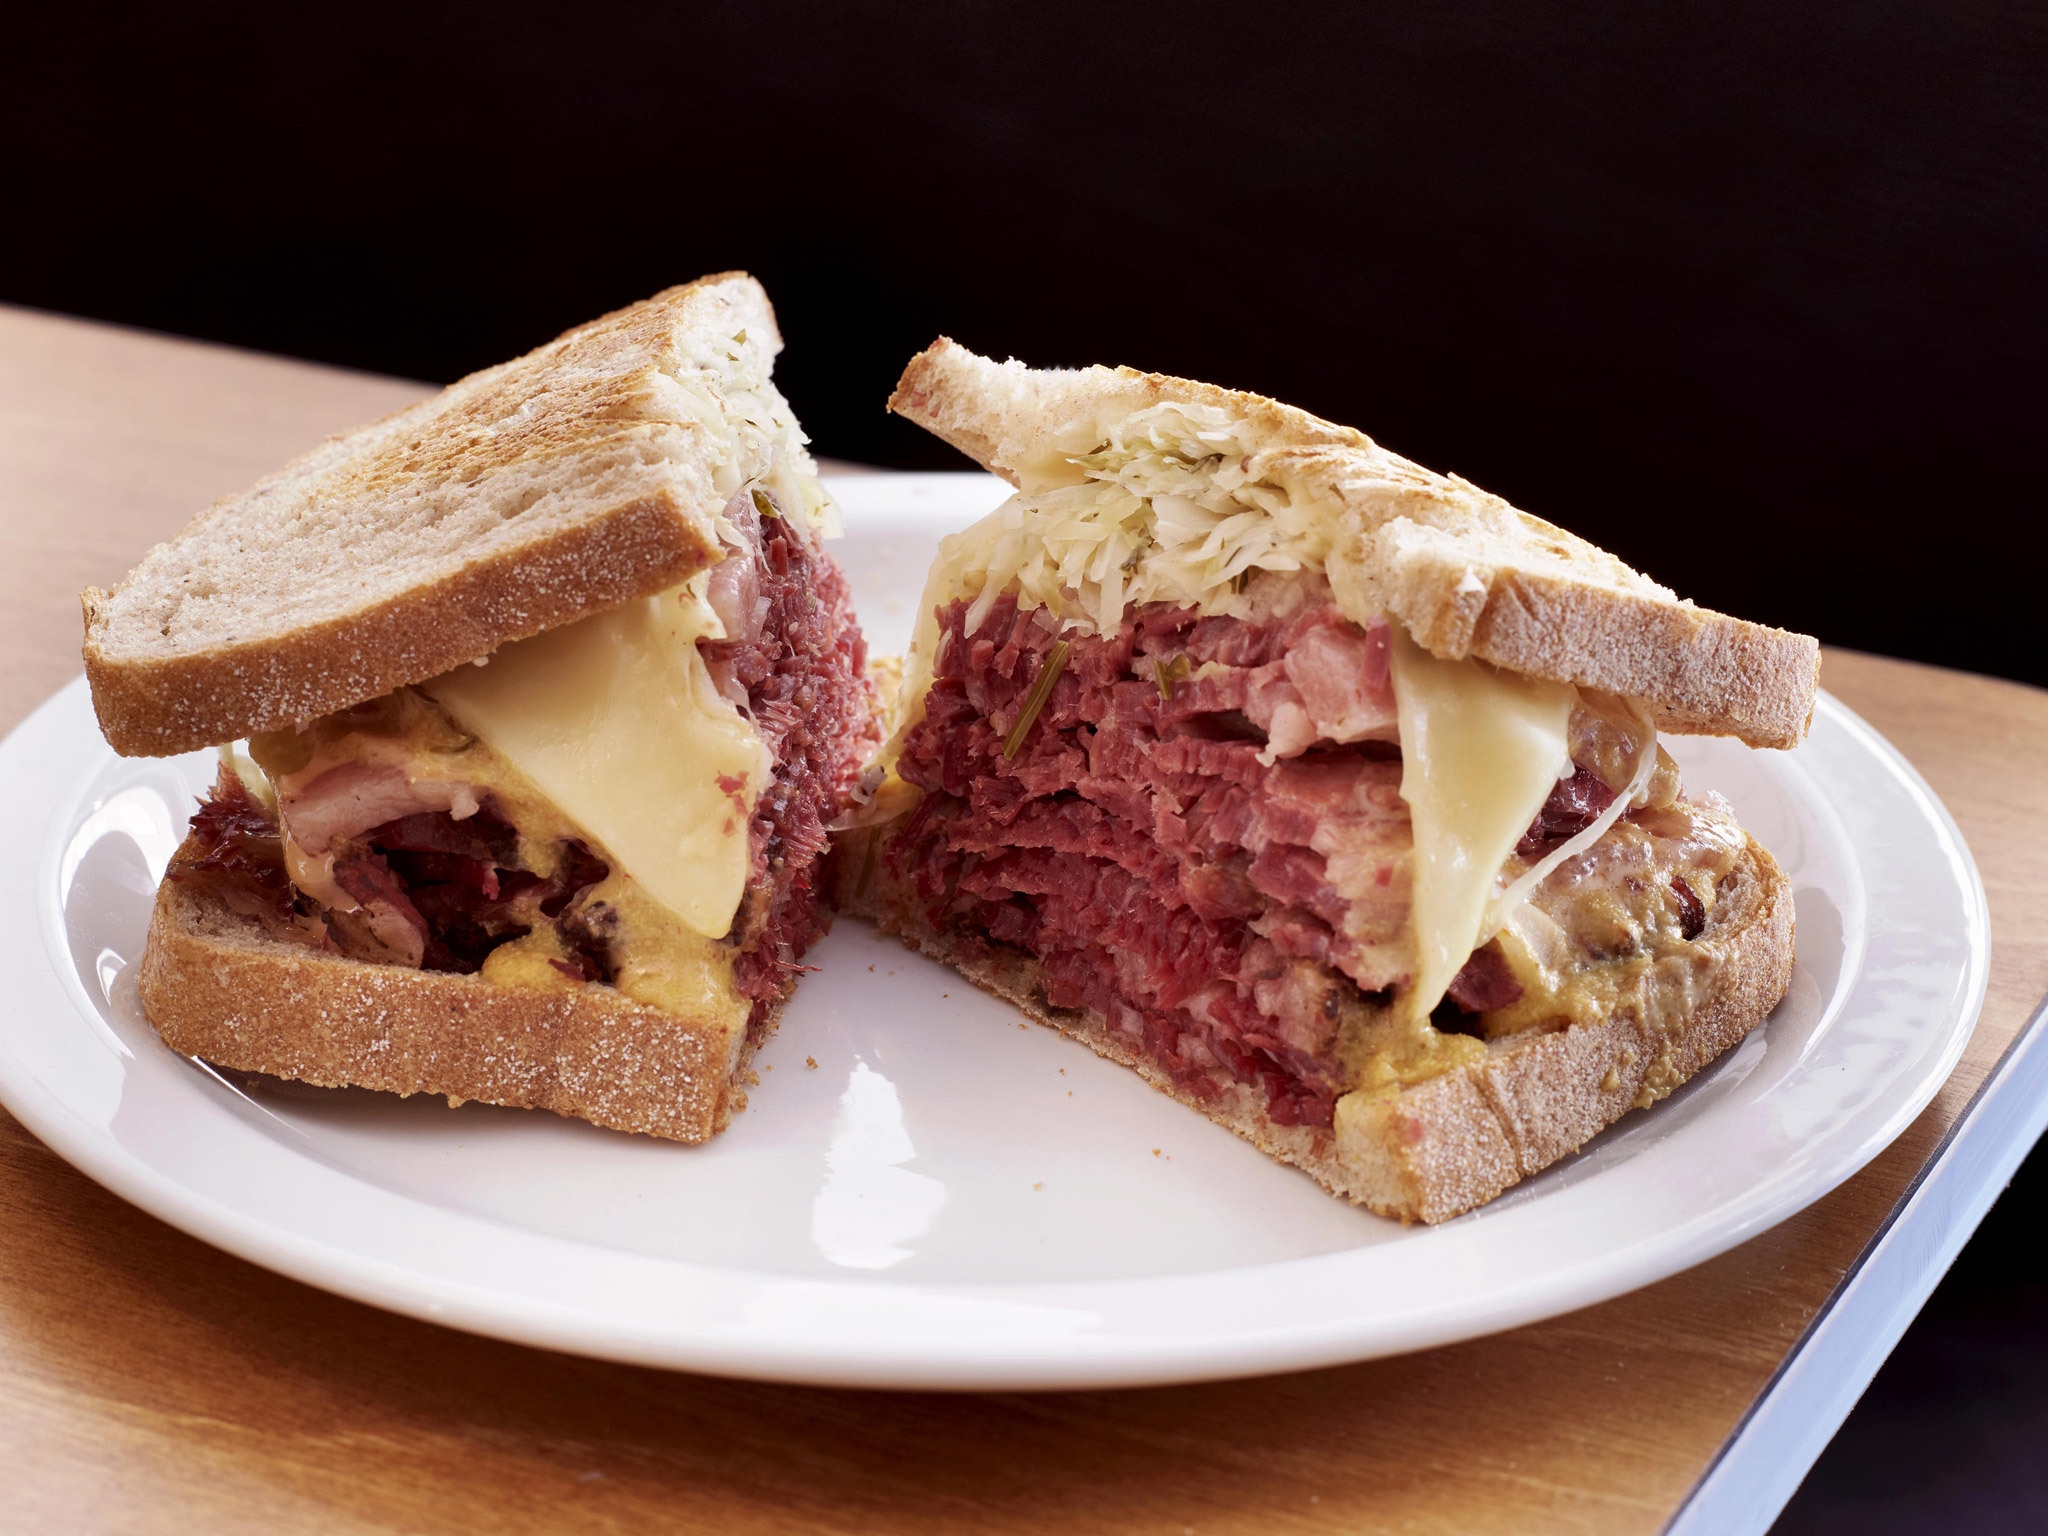 Reuben sandwich at Monty's Deli